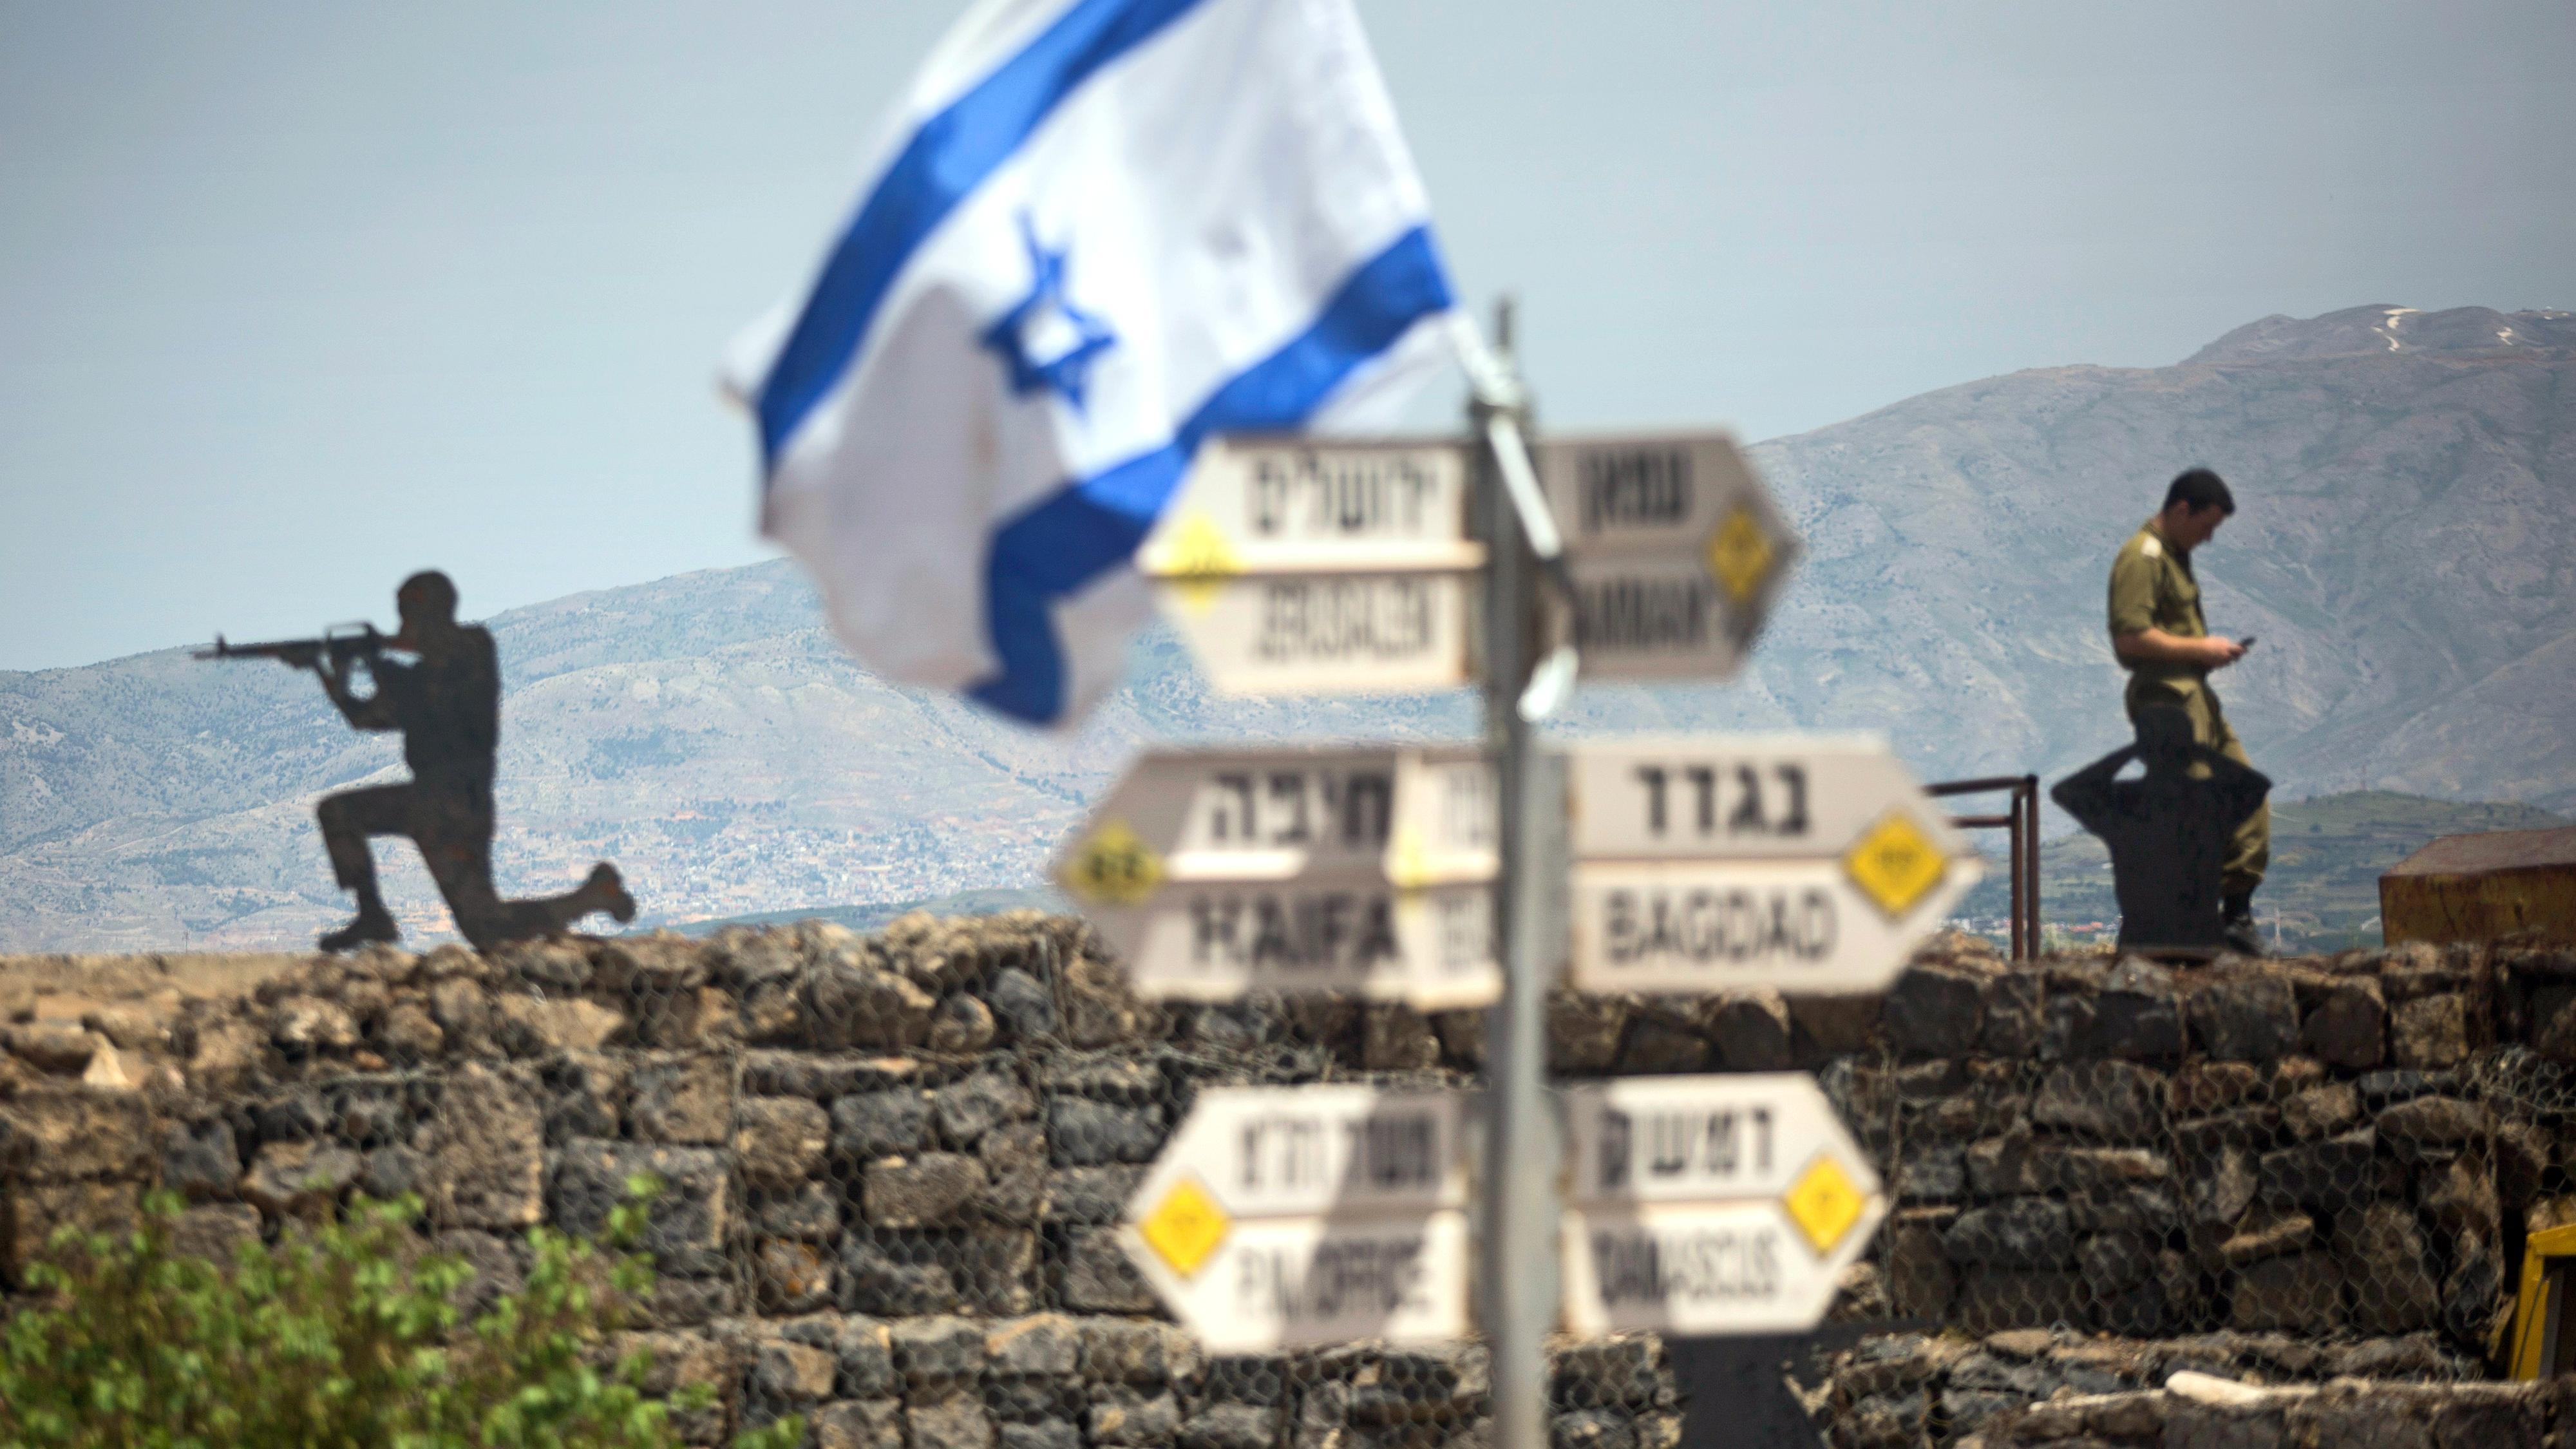 Donald Trump will Souveränität Israels über Golanhöhen anerkennen